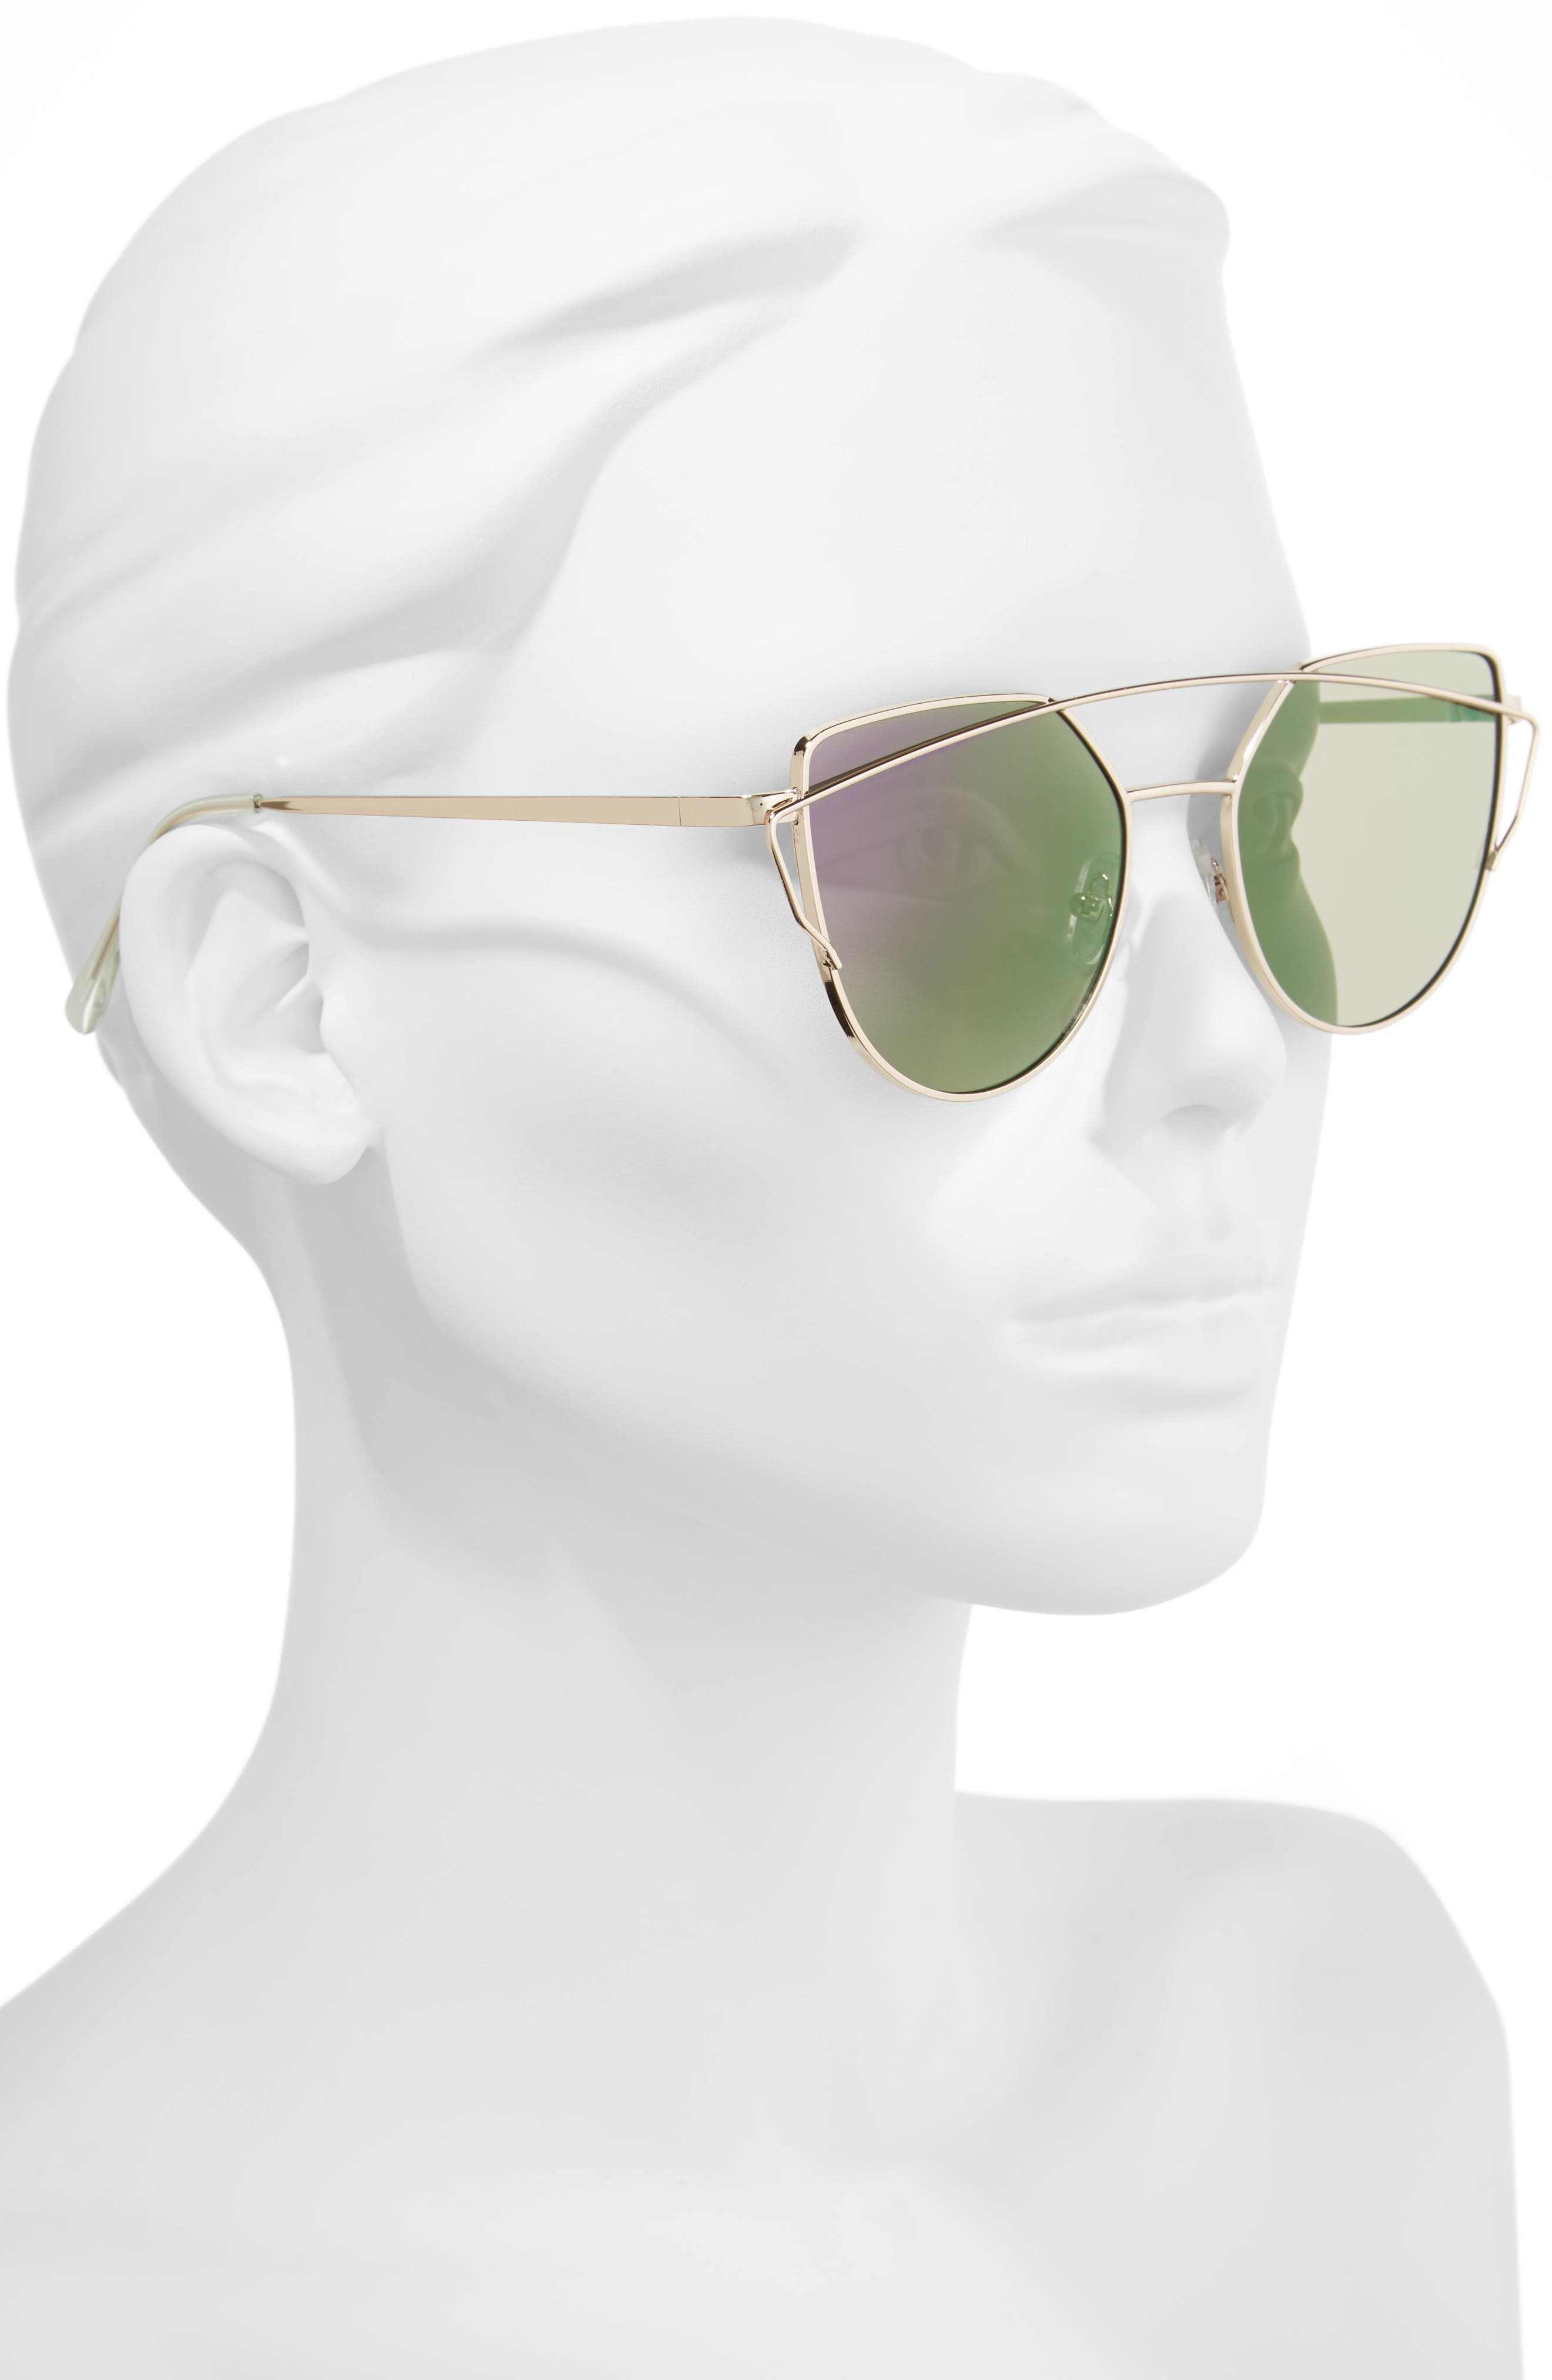 52mm Thin Brow Angular Aviator Sunglasses,                             Alternate thumbnail 2, color,                             Gold/ Purple